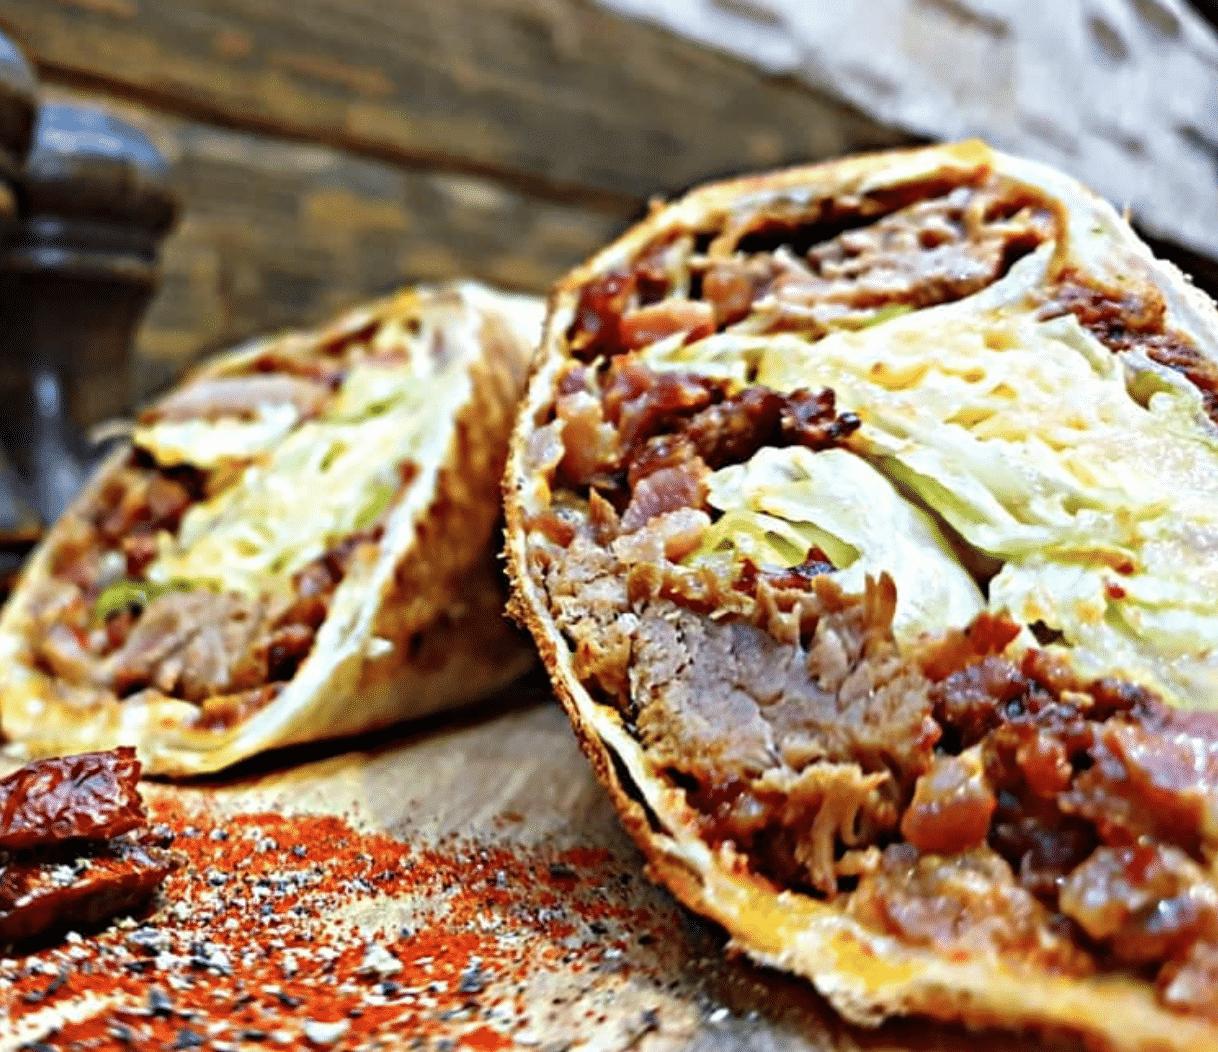 Bors Gastro Bar Sandwich